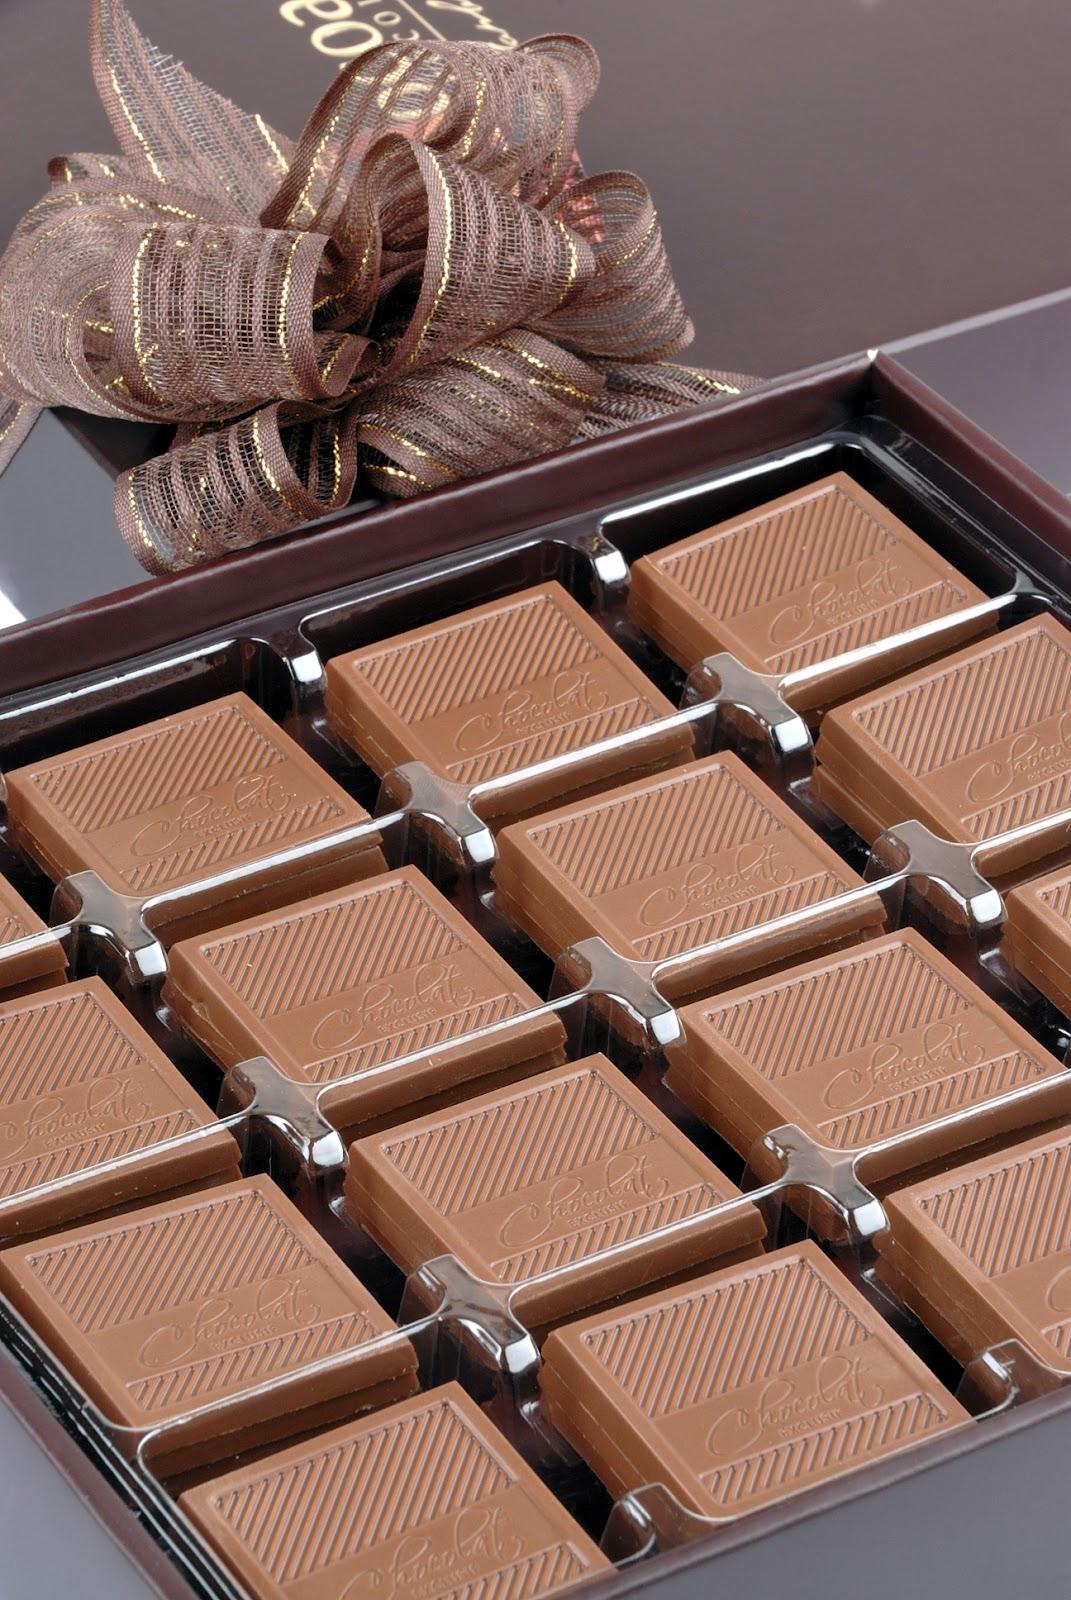 Ayna s yle bana bayram hediyeniz cocoas chocolat 39 tan for Divan madlen 750 gr